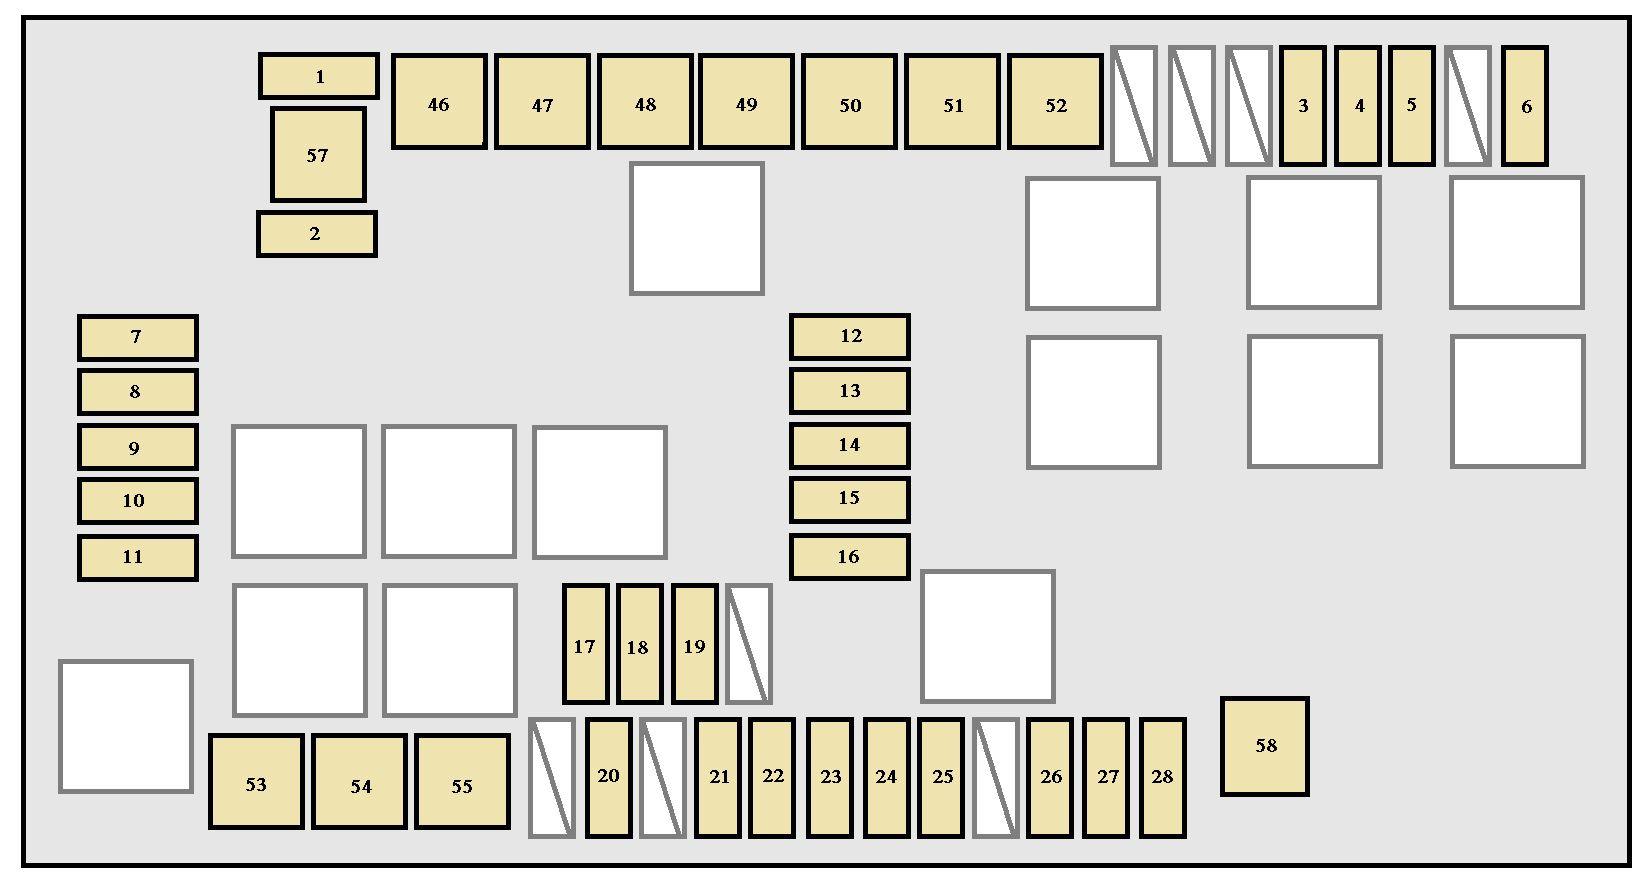 Diagram 2002 4runner Fuse Box Diagram Full Version Hd Quality Box Diagram Diagramboasf Abacusfirenze It